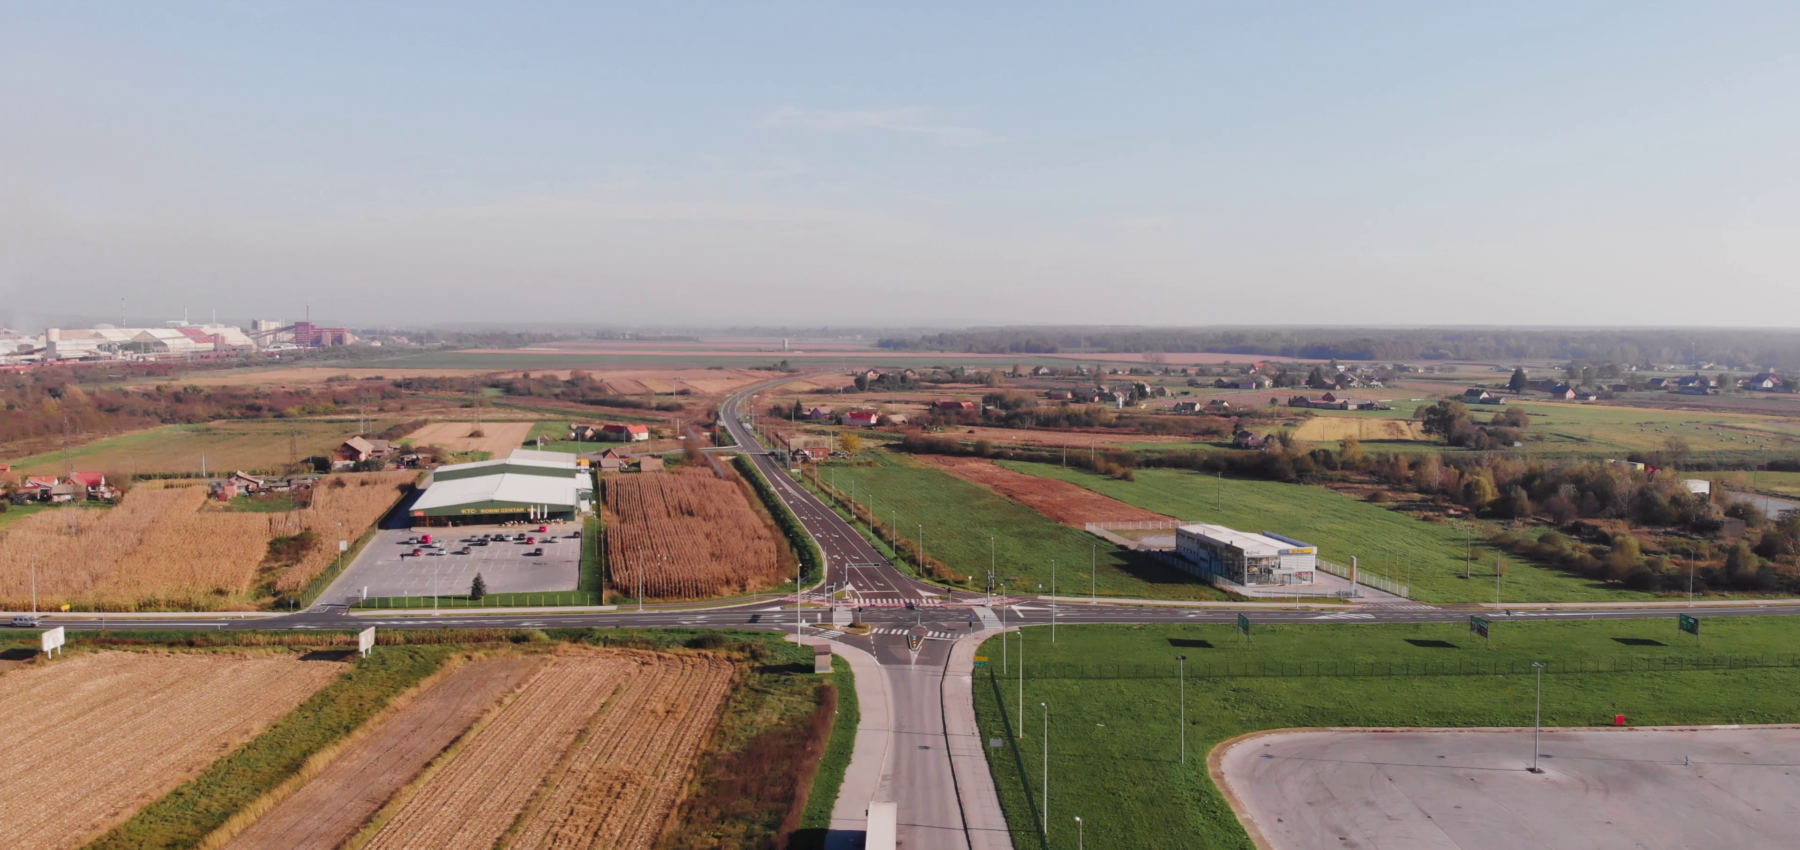 Kutina, ILZ, KIND, Industrijsko logistička zona Kutina